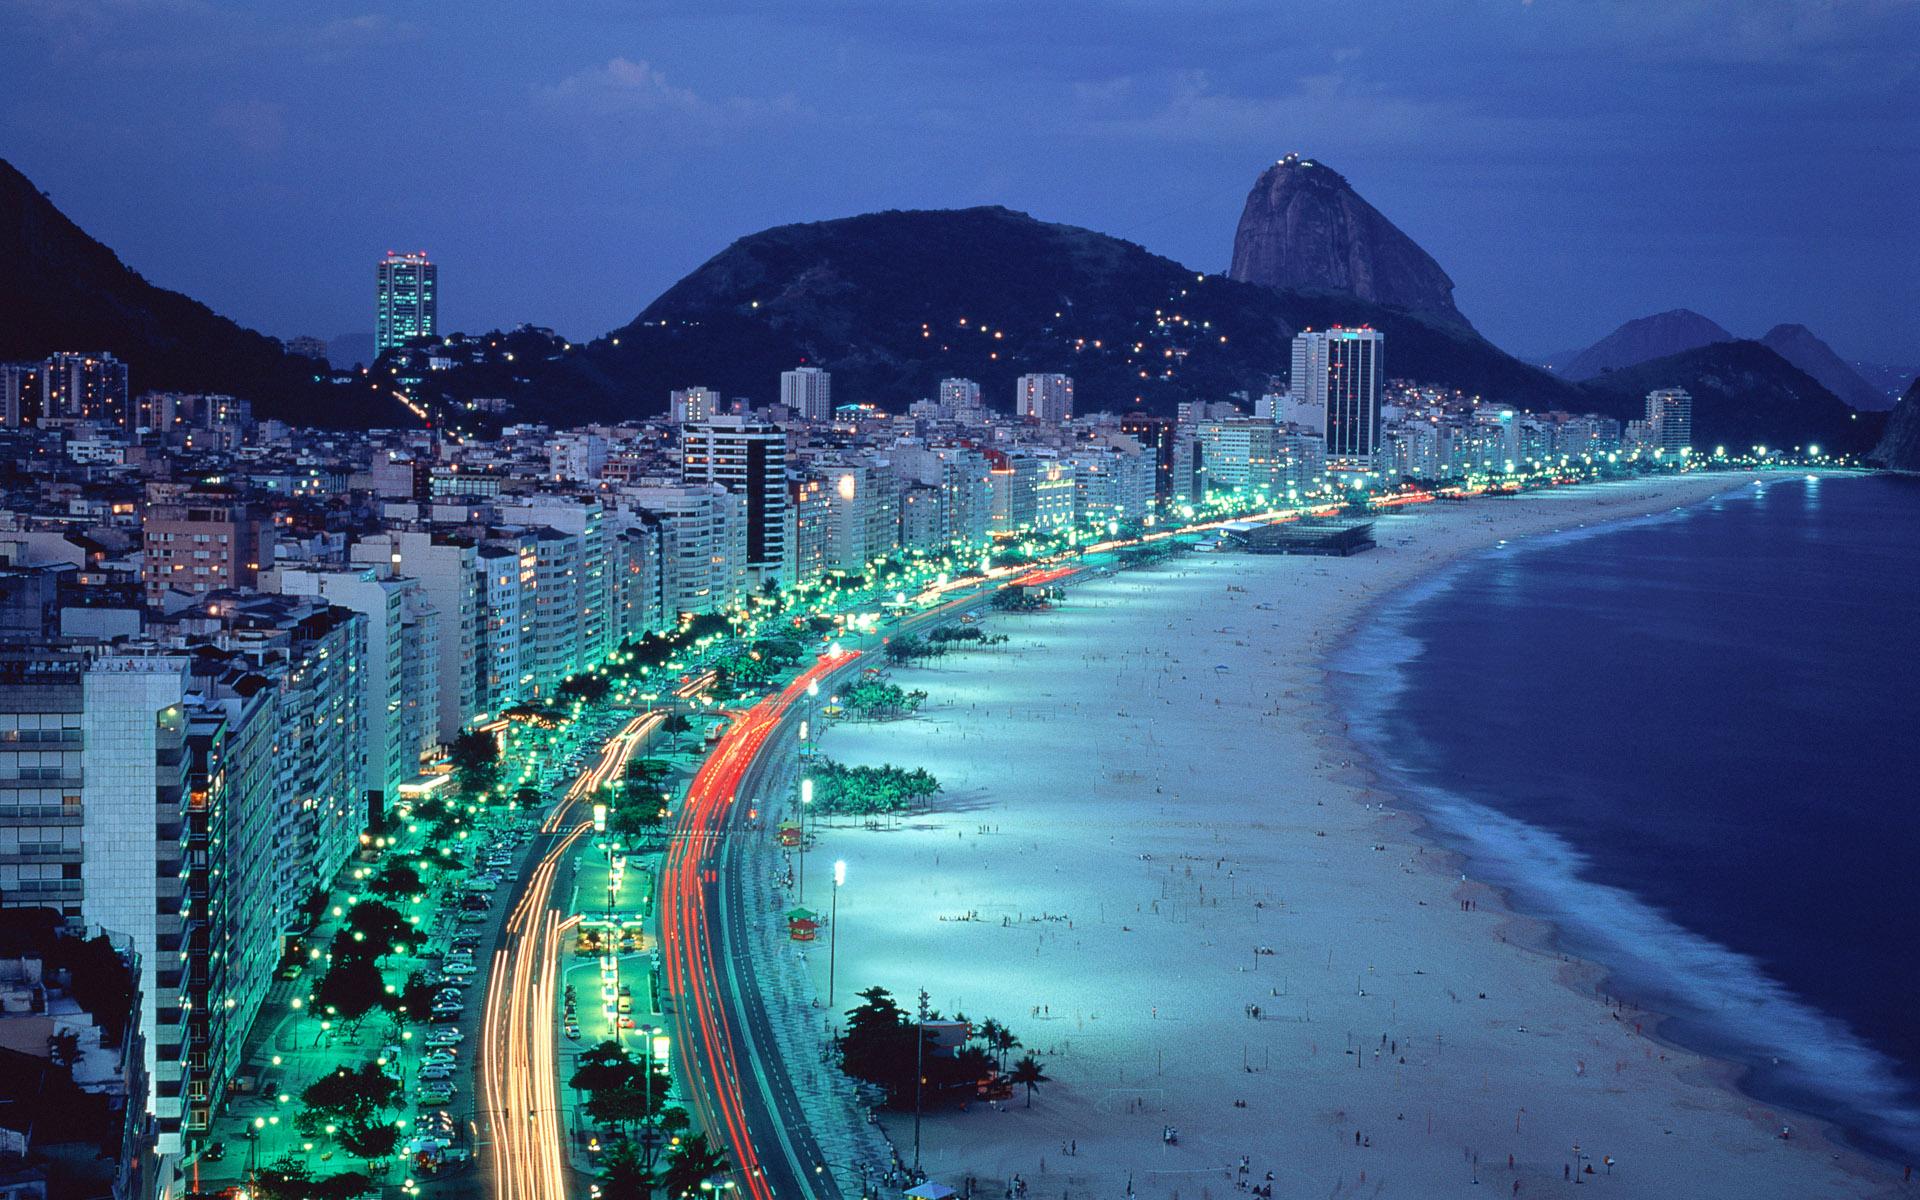 Praia de Copacabana no Rio de Janeiro, Brasil (Copacabana Beach at Rio de Janeiro, Brazil)